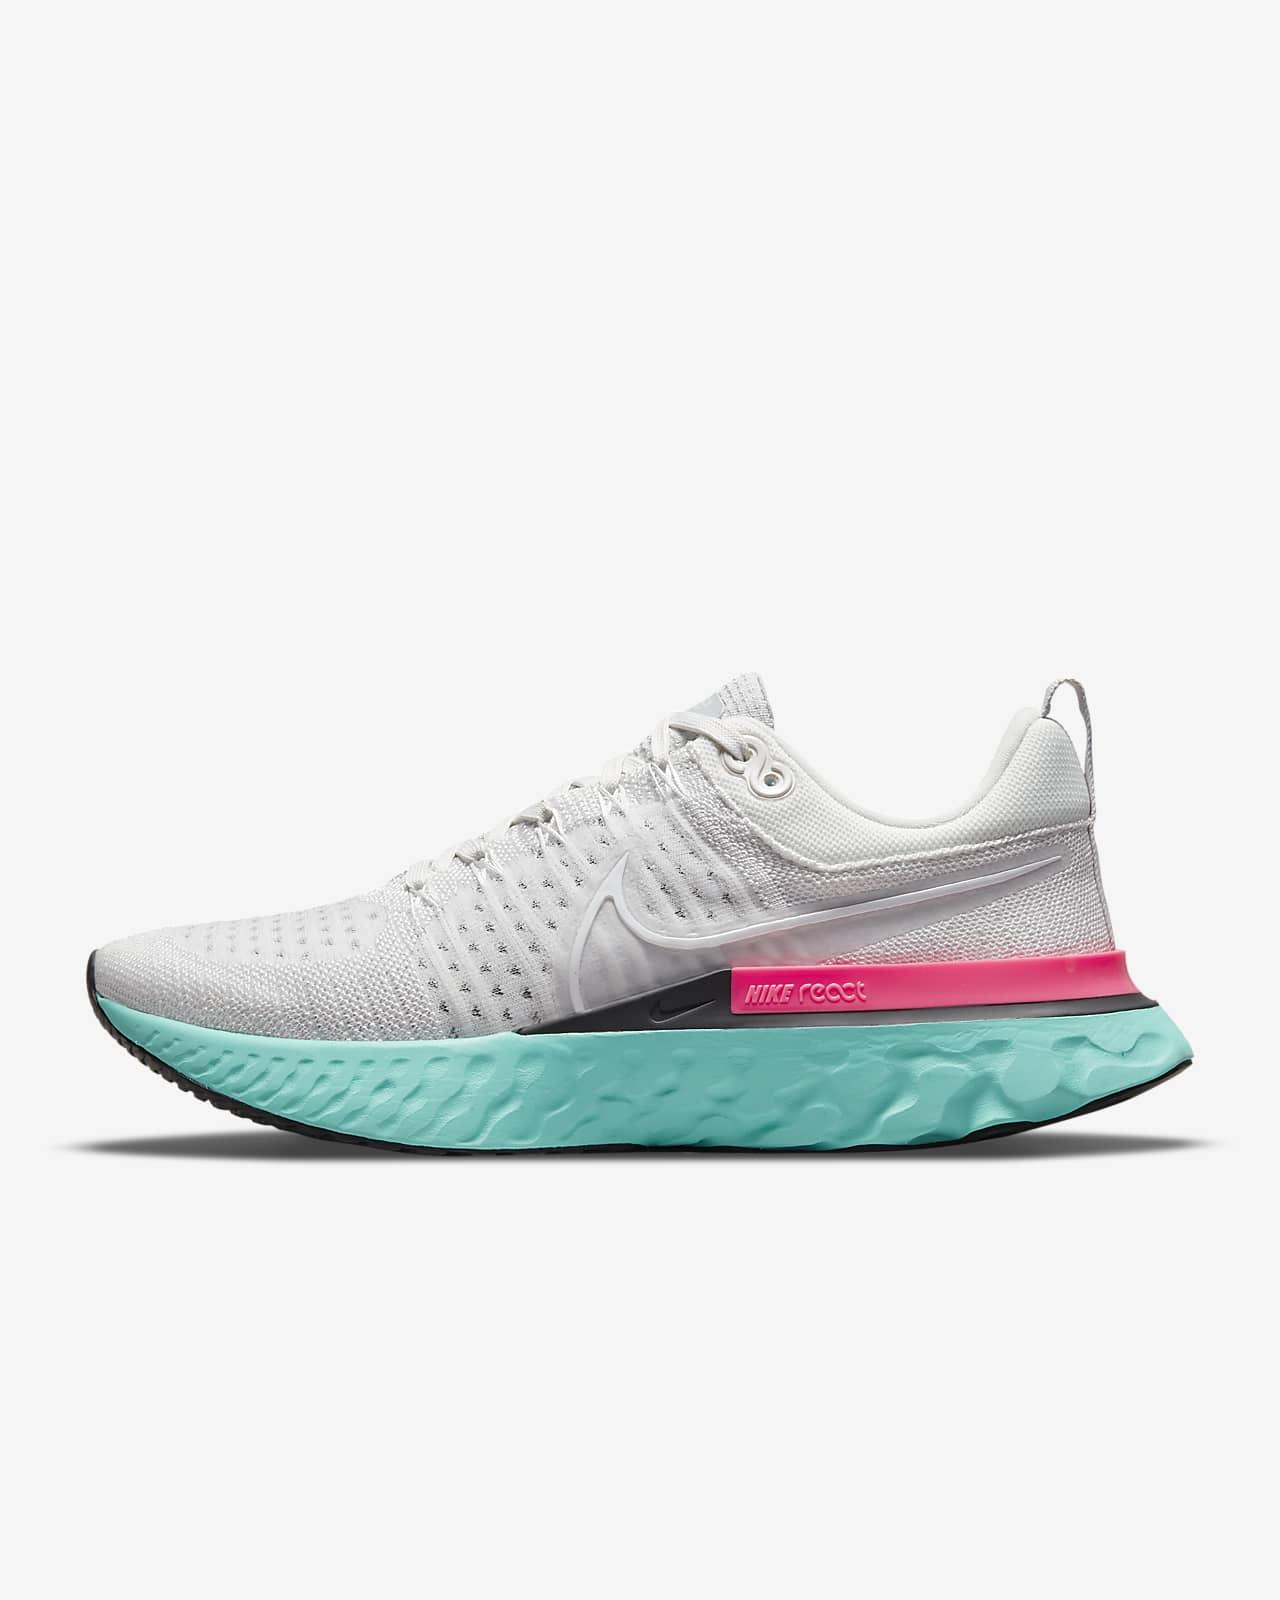 Chaussures de running Nike React Infinity Run Flyknit 2 pour Homme